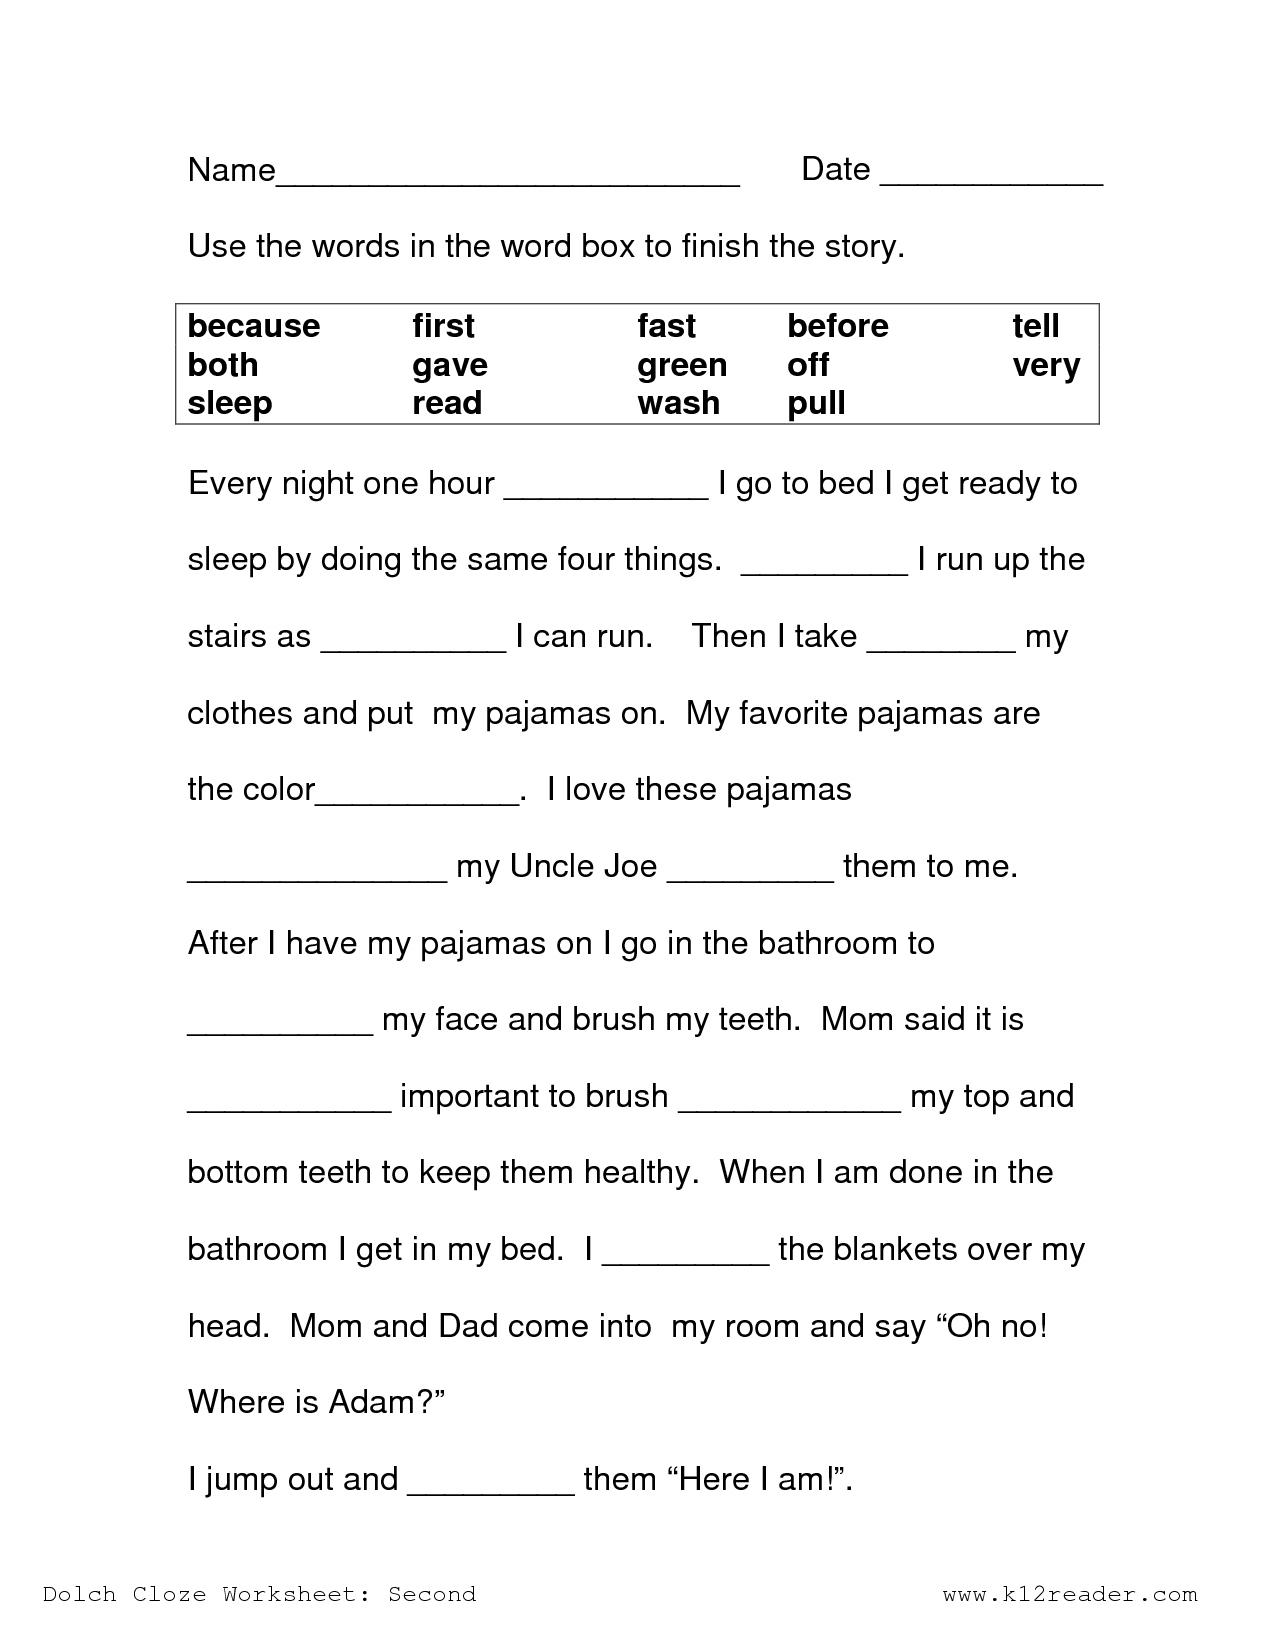 Free Printable Reading Comprehension Worksheets 3Rd Grade To Print   Free Printable 3Rd Grade Reading Worksheets